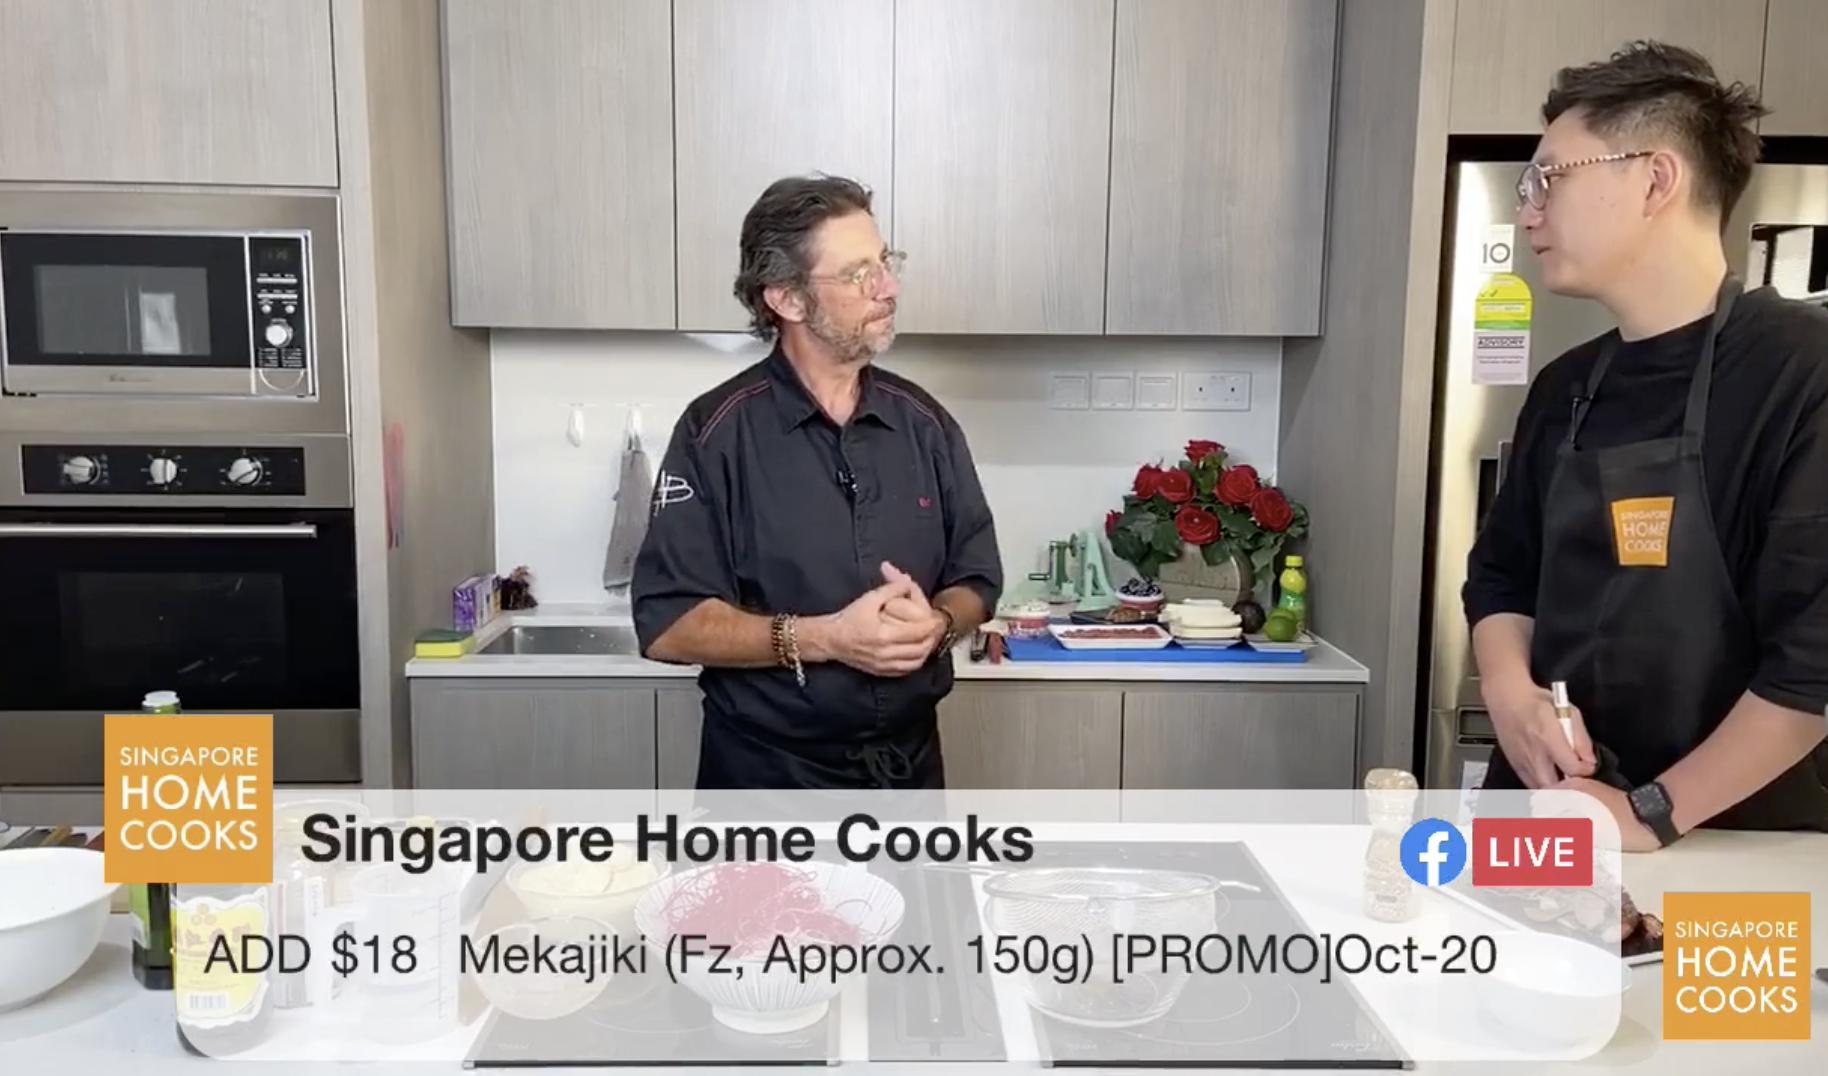 Singapore Home Cooks Digital Marketing Agency